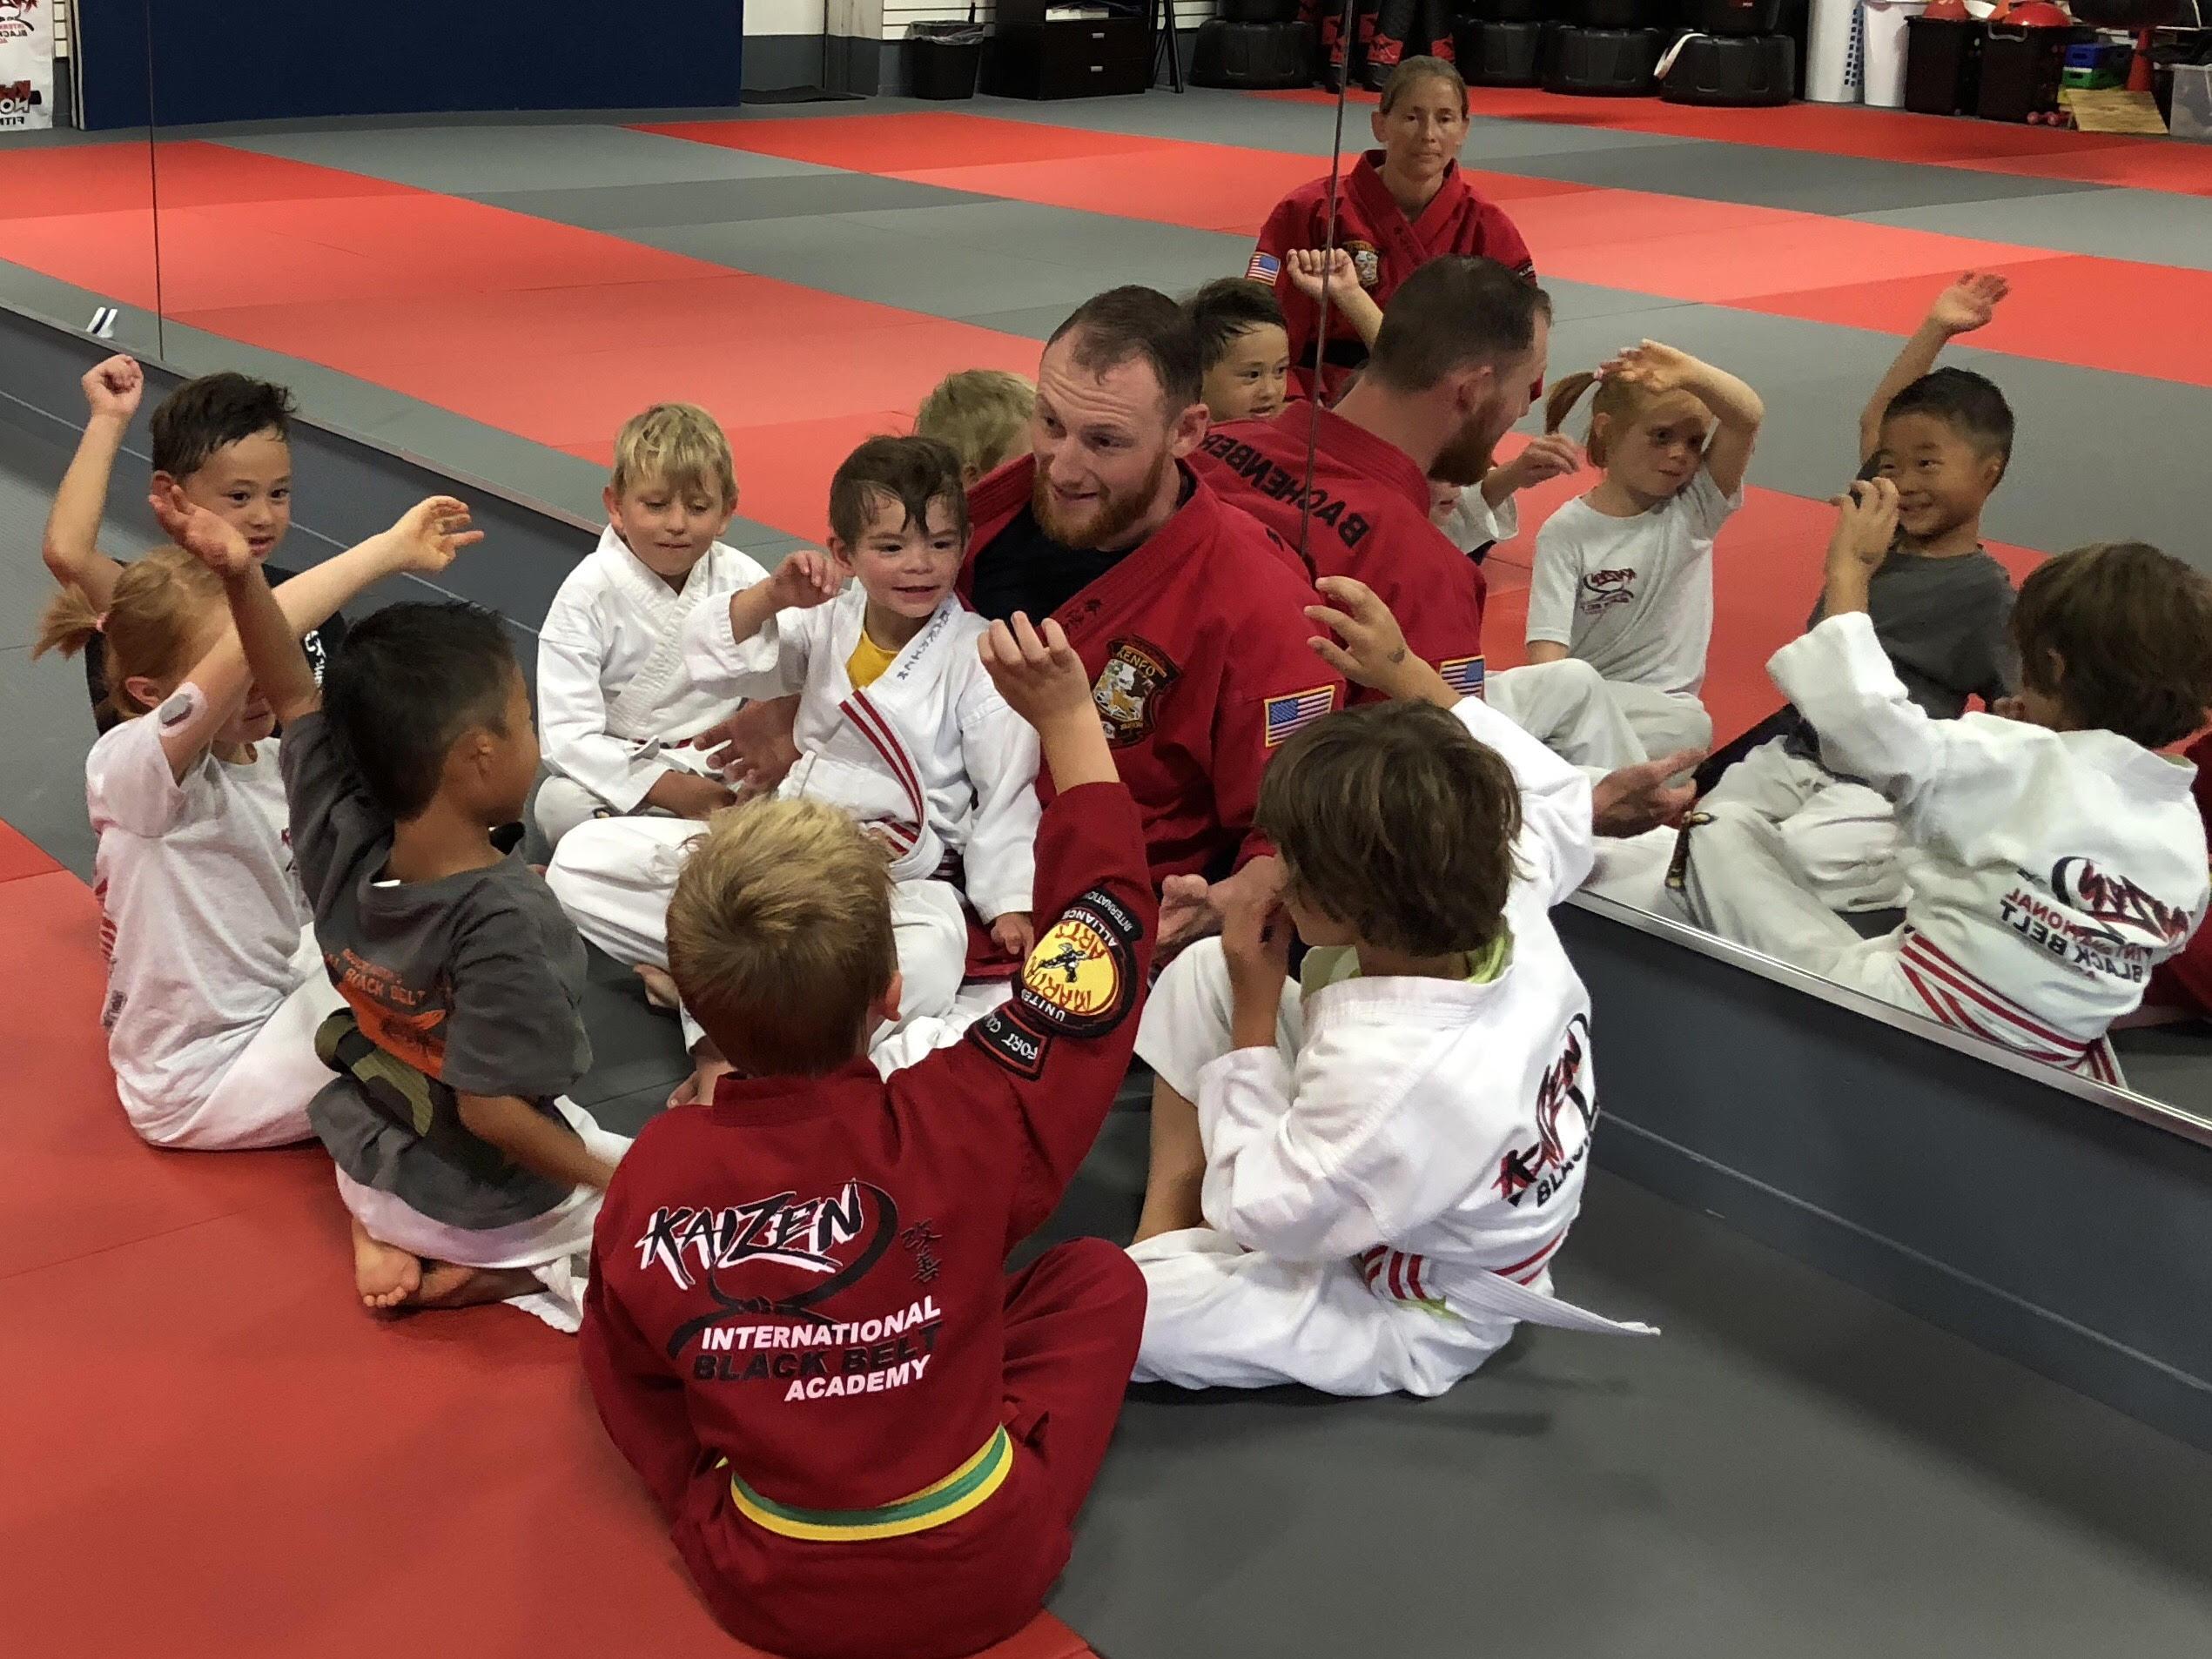 Colorado's Top Rated Local® Martial Arts Award Winner: Kaizen International Black Belt Academy